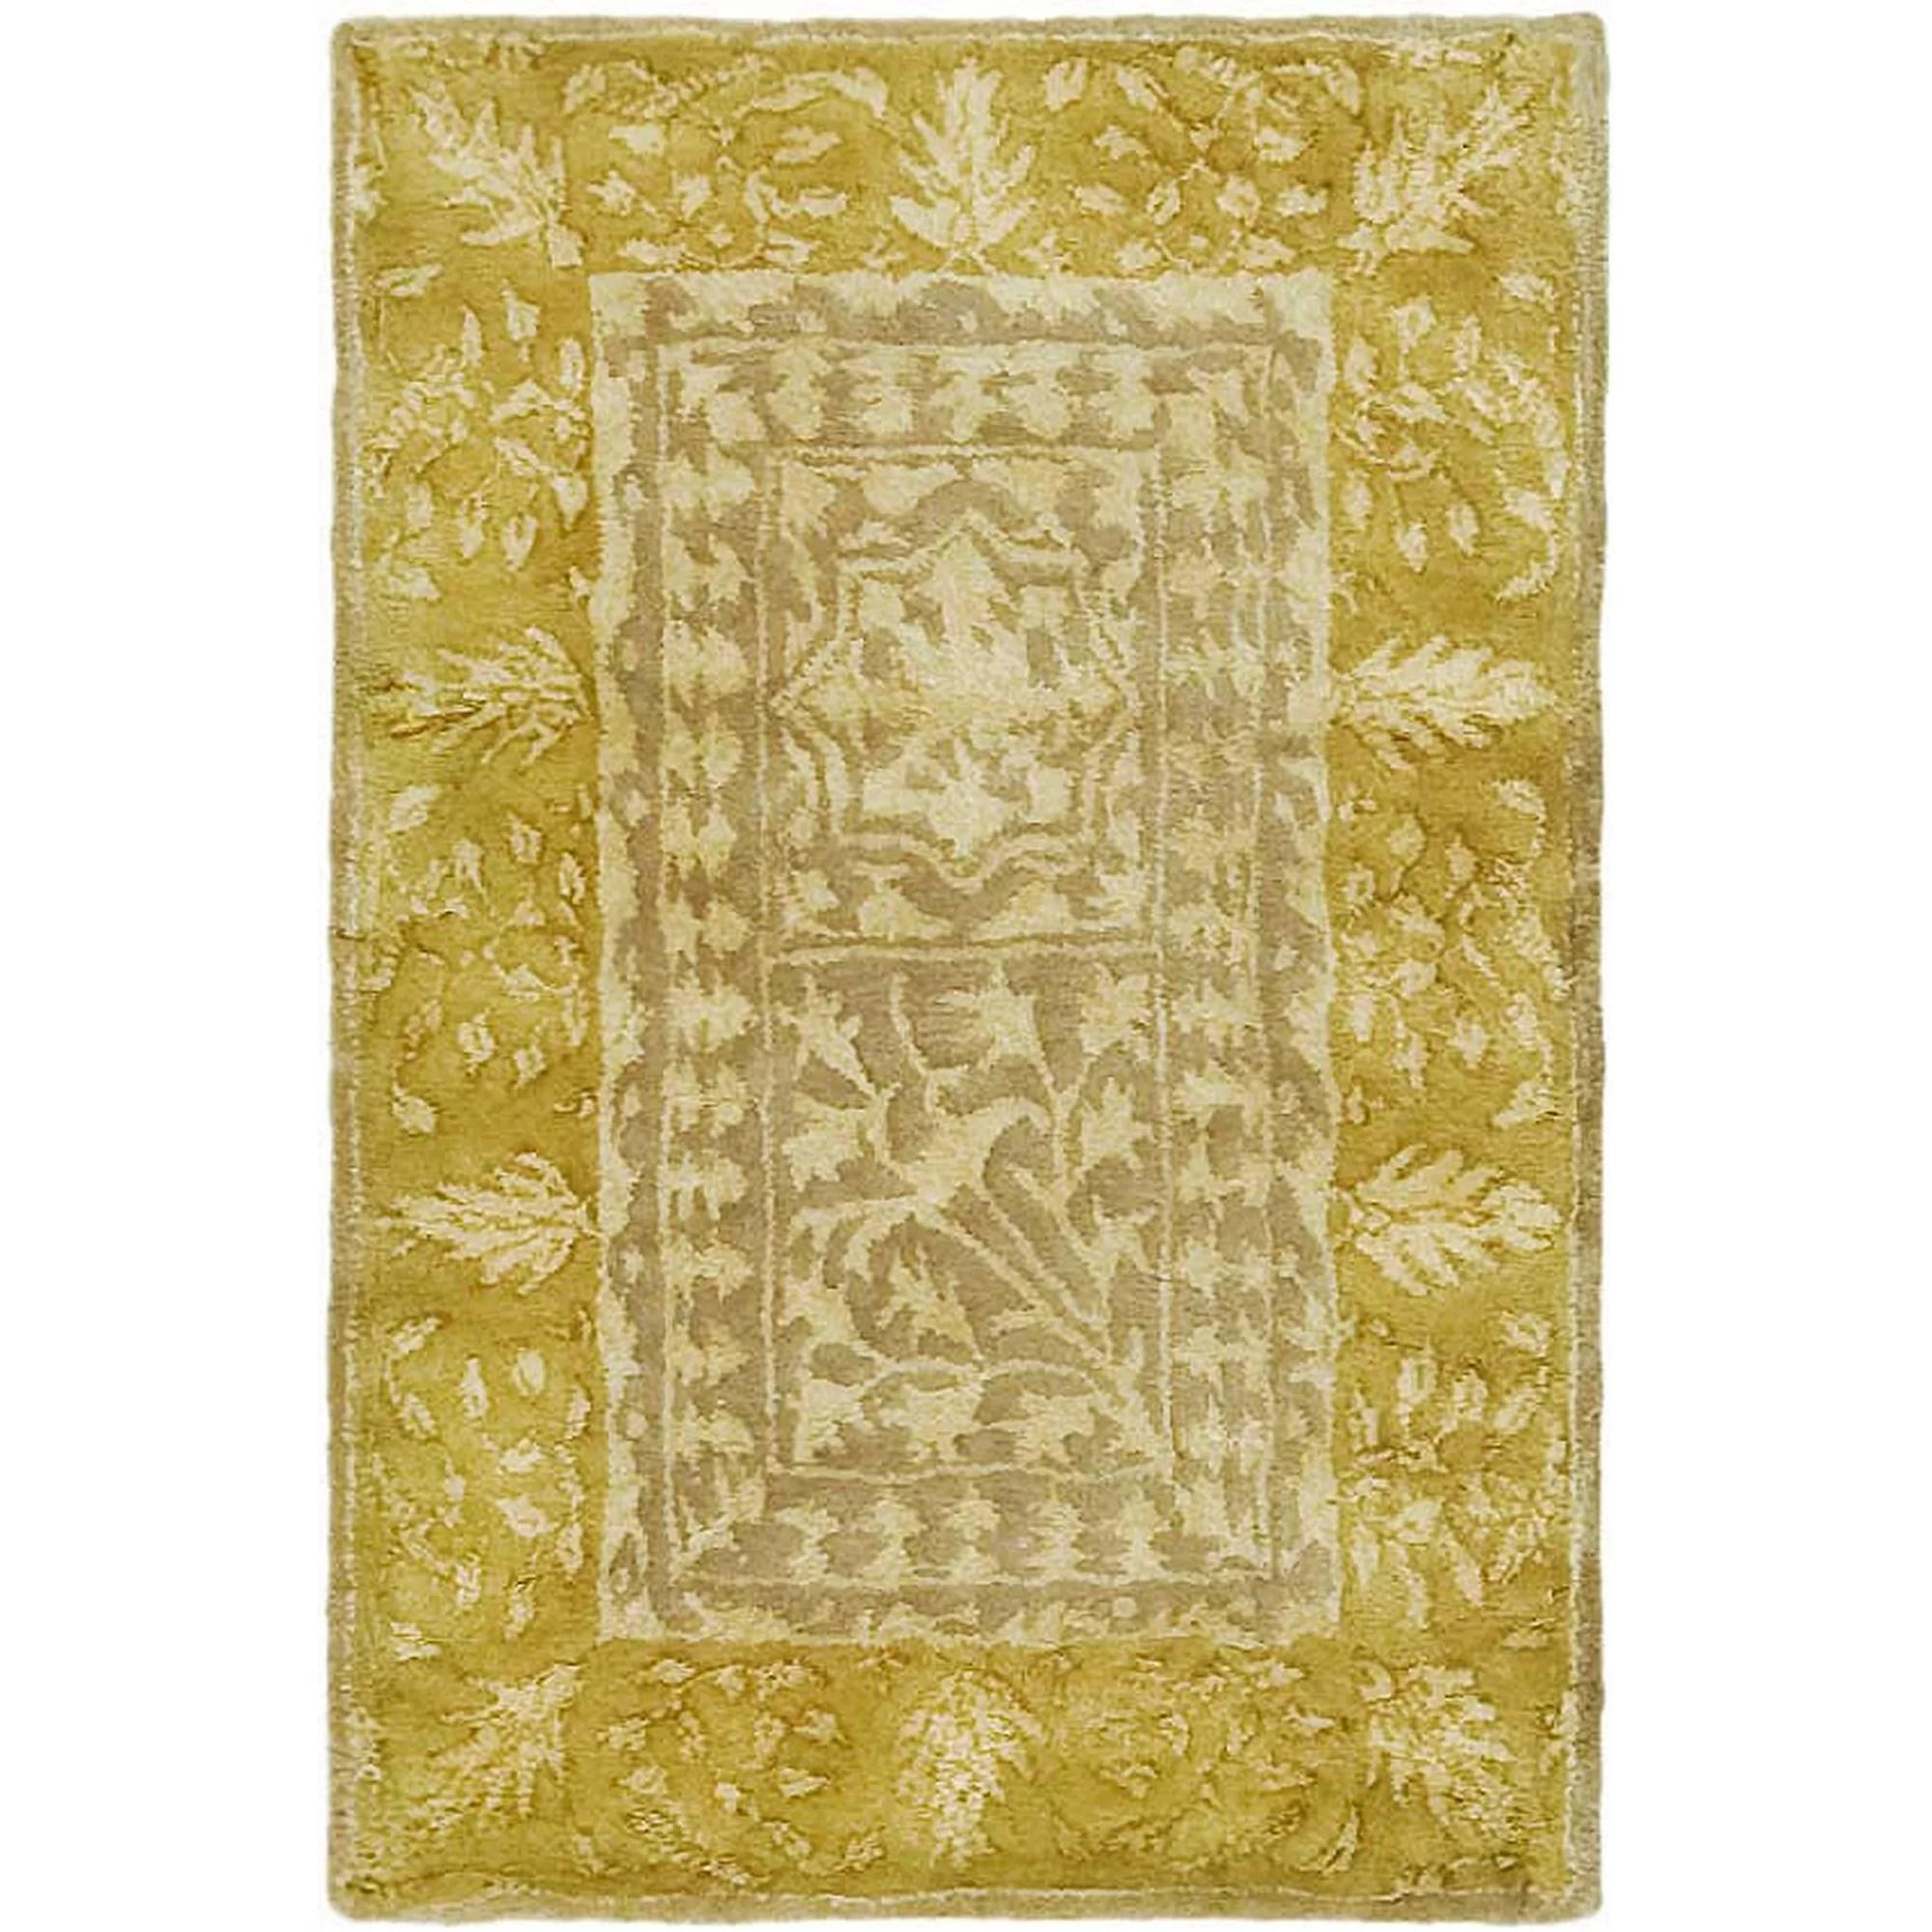 Safavieh Silk Road BeigeLight Gold Area Rug  Reviews  Wayfair